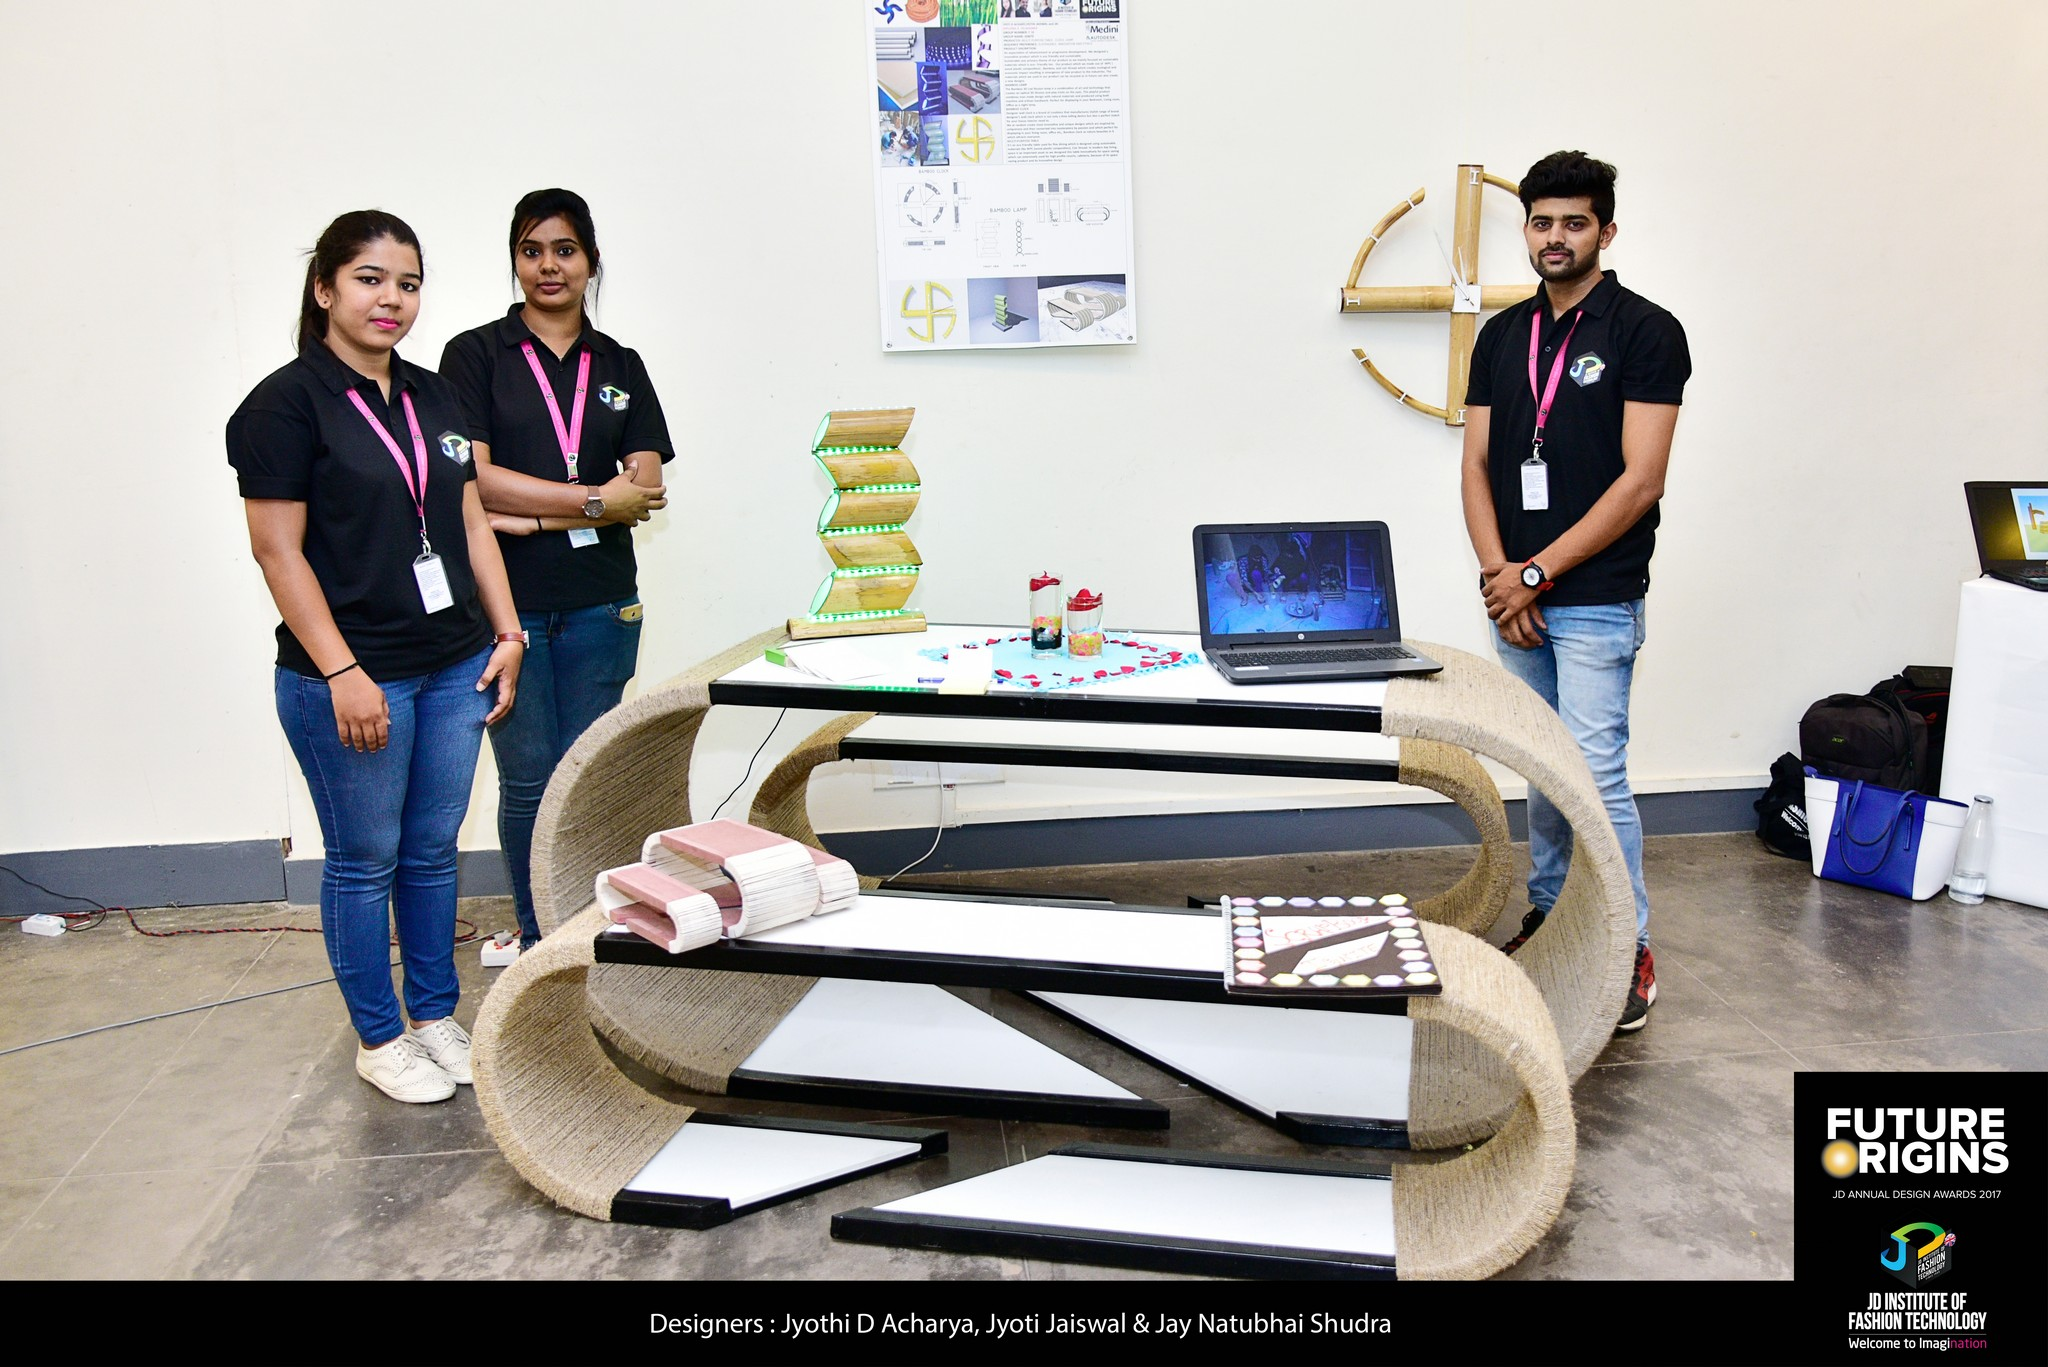 Ignite - Future Origin - JD Annual Design Awards 2017   Photography : Jerin Nath (@jerin_nath) ignite - Ignite     Future Origin     JD Annual Design Awards 2017 1 - Ignite – Future Origin – JD Annual Design Awards 2017